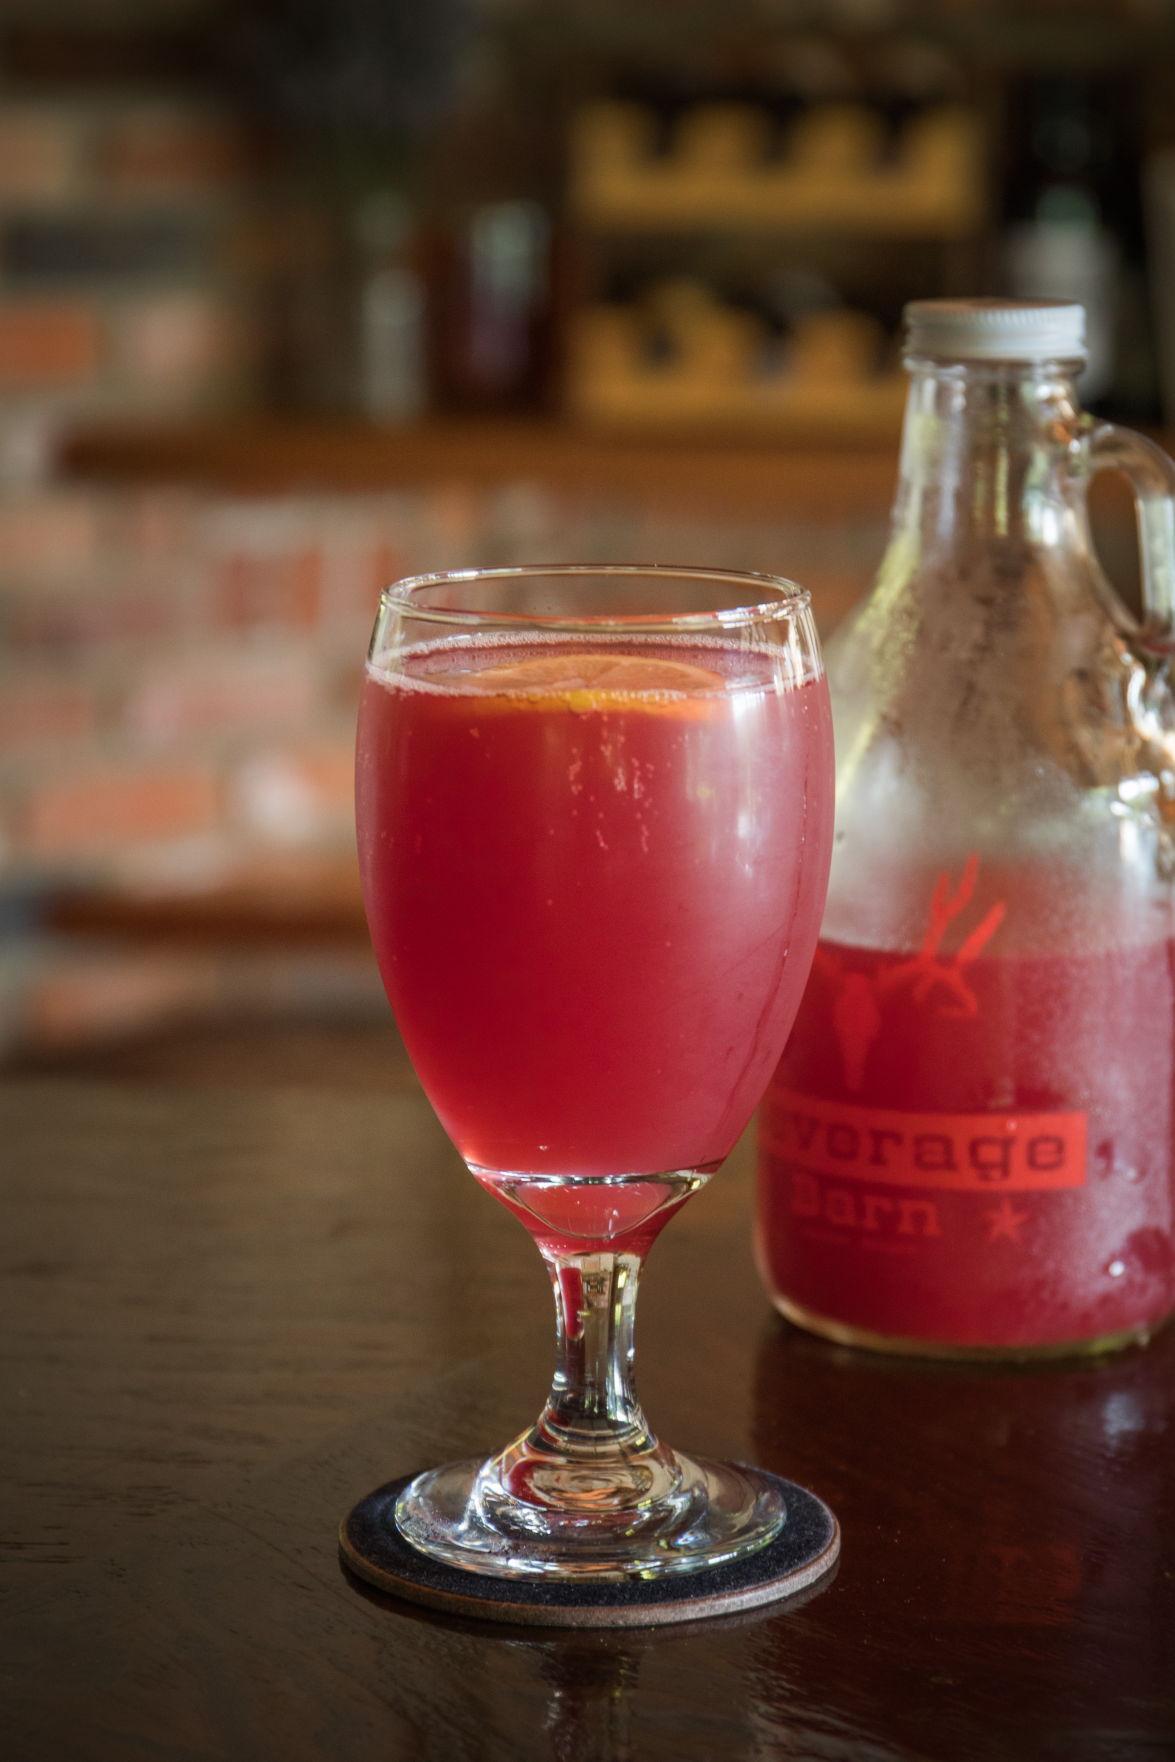 Bandon Rain - Cranberry Apple Squall